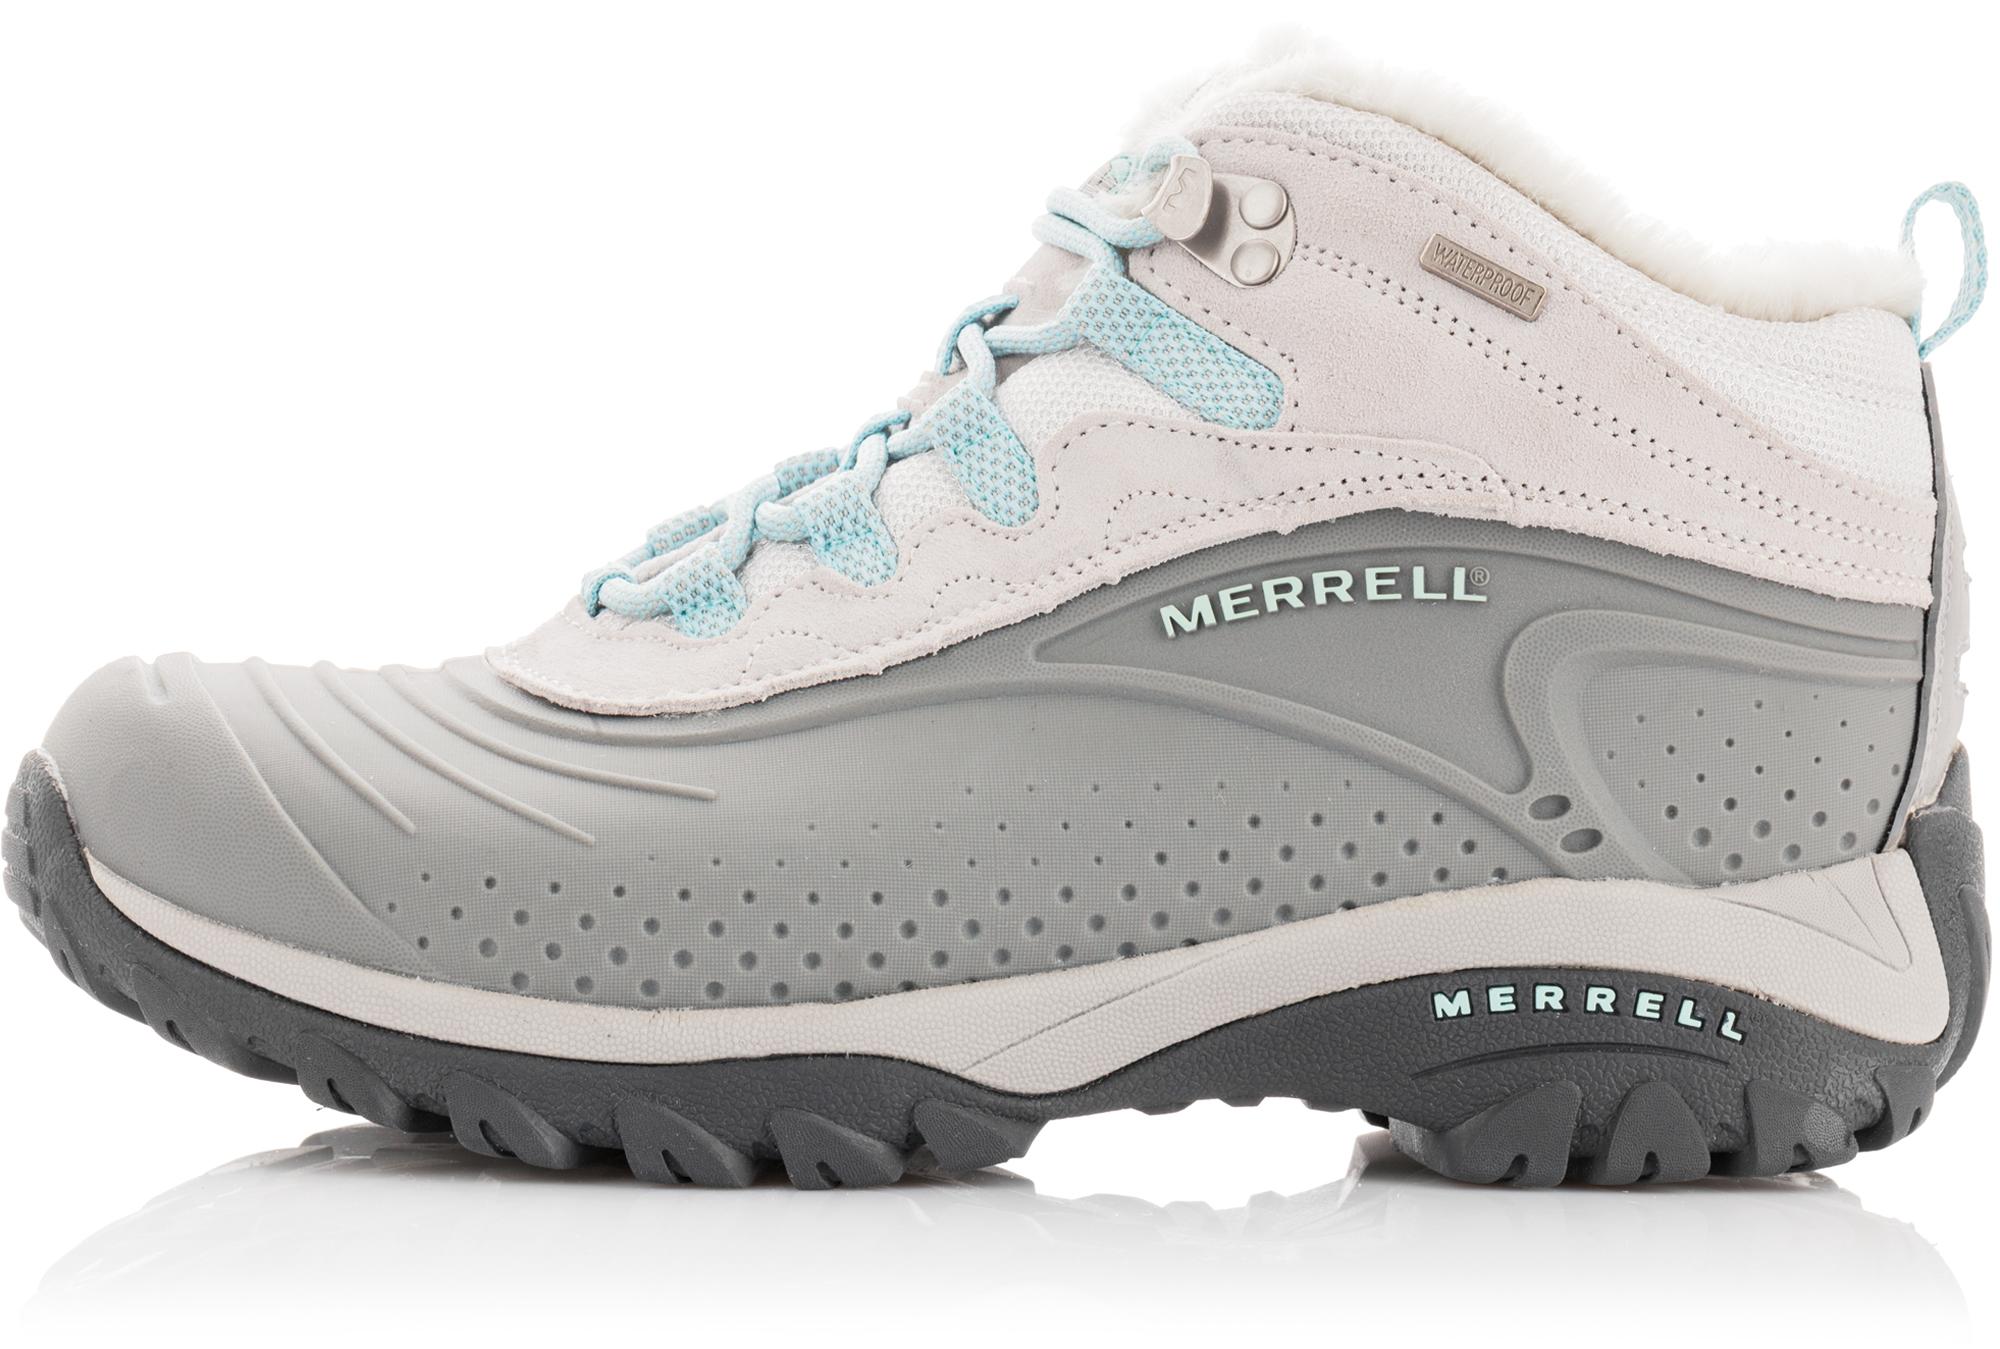 цена на Merrell Ботинки утепленные женские Merrell Storm Trekker 6, размер 42